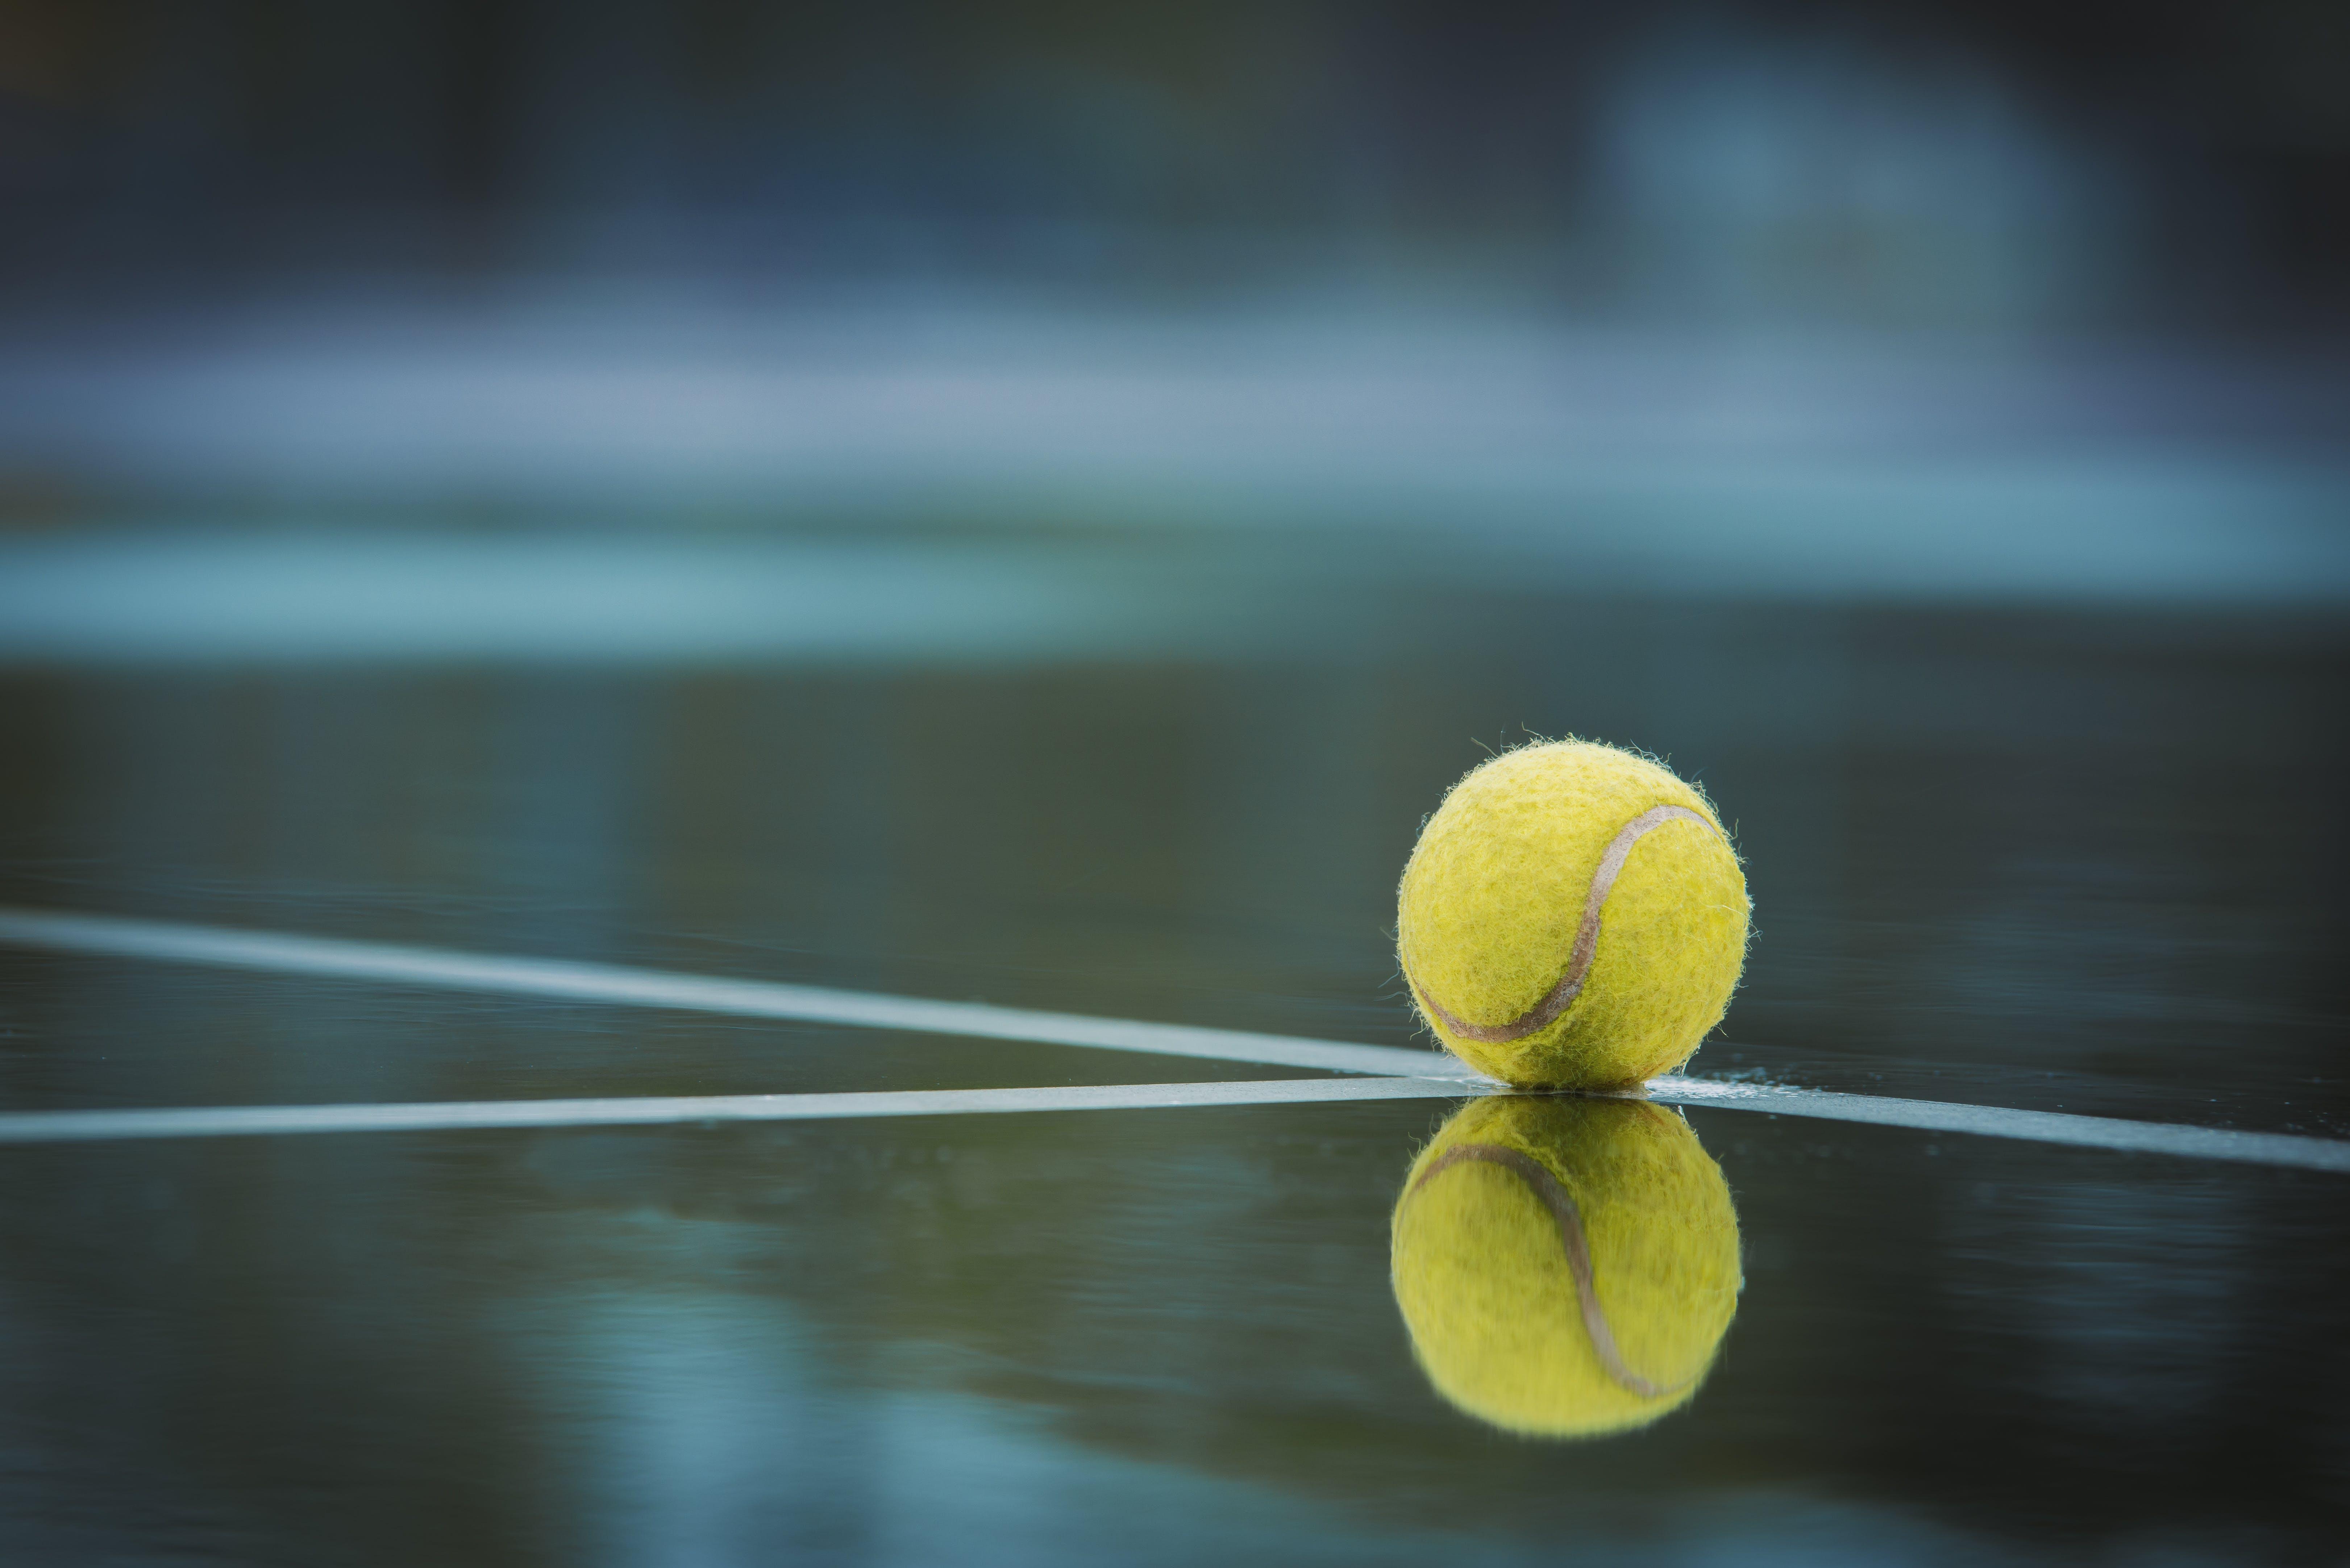 Kostenloses Stock Foto zu ball, reflektierung, tennis ball